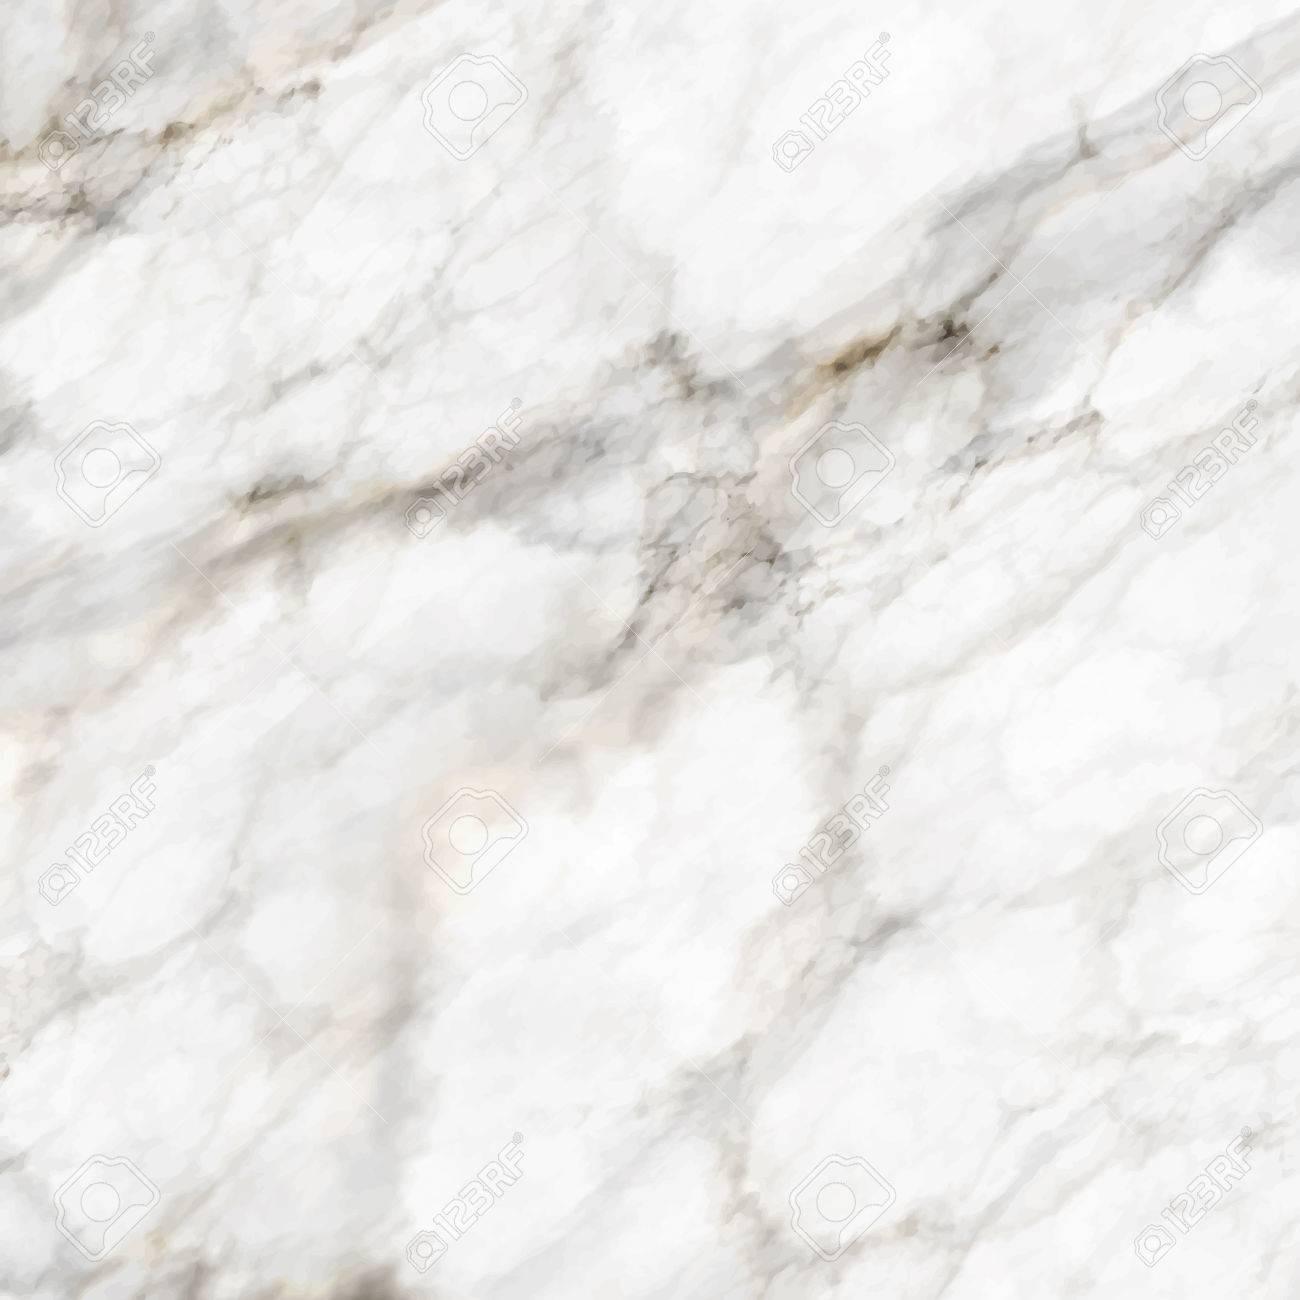 Seamless white marble texture background - 81579485